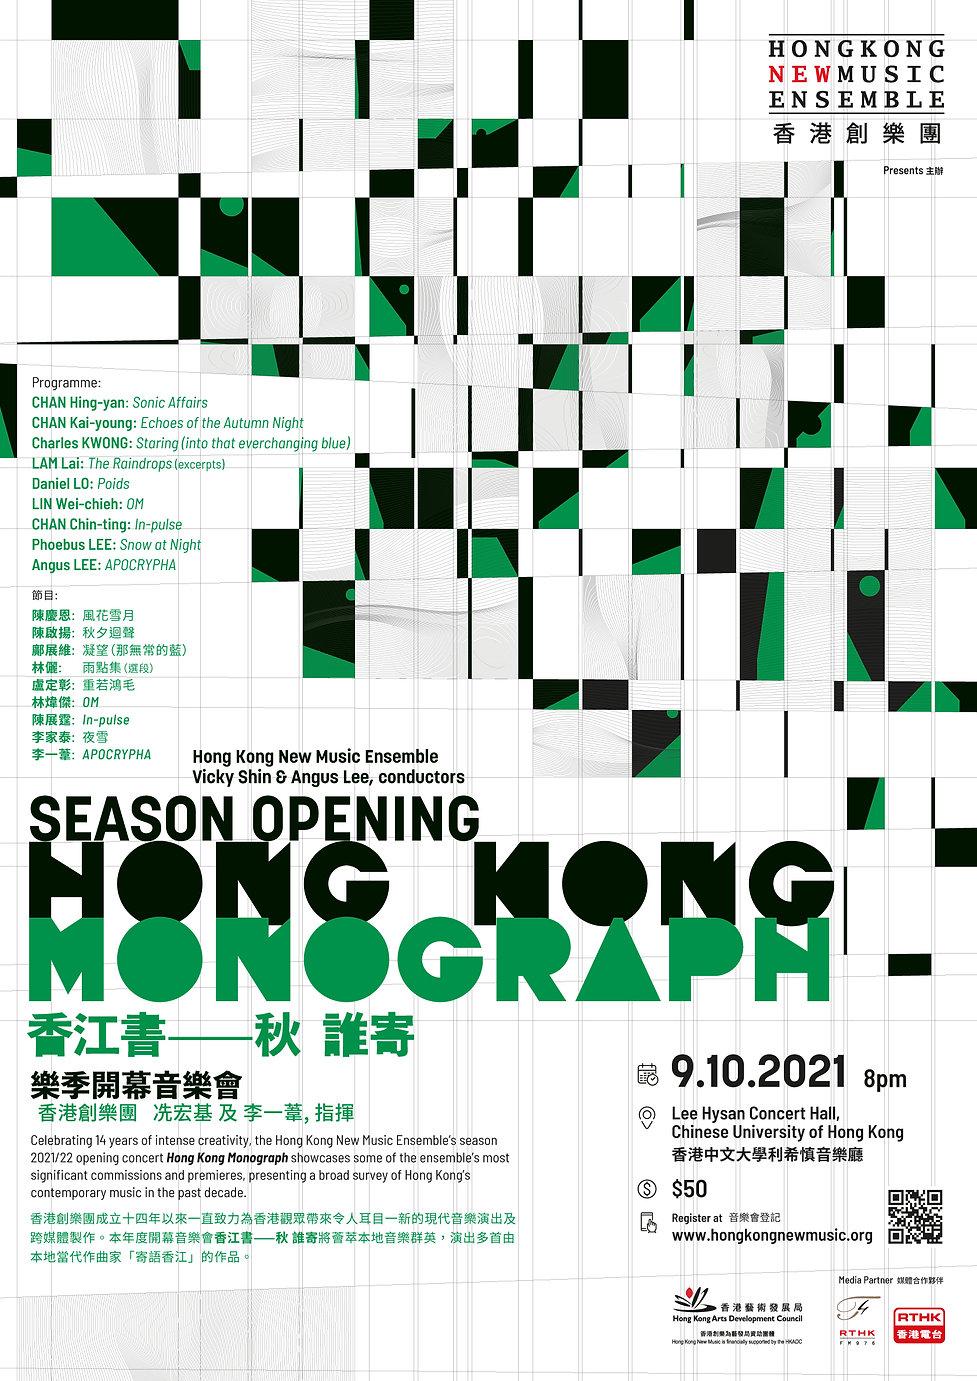 HK Monograph Poster.jpg